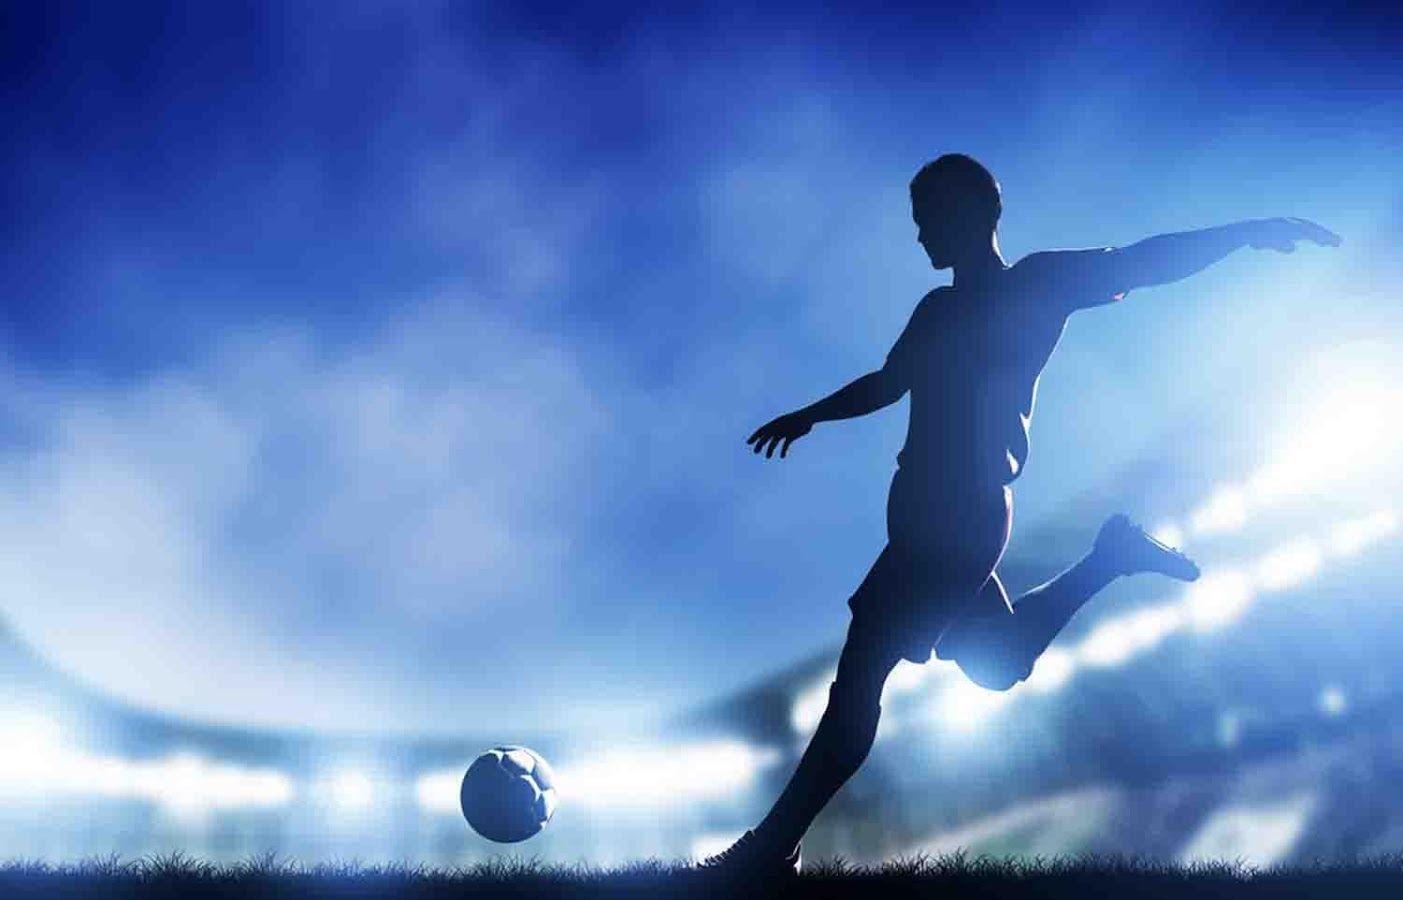 Soccer Wallpaper Buscar Con Google Soccer Images Soccer Football Club